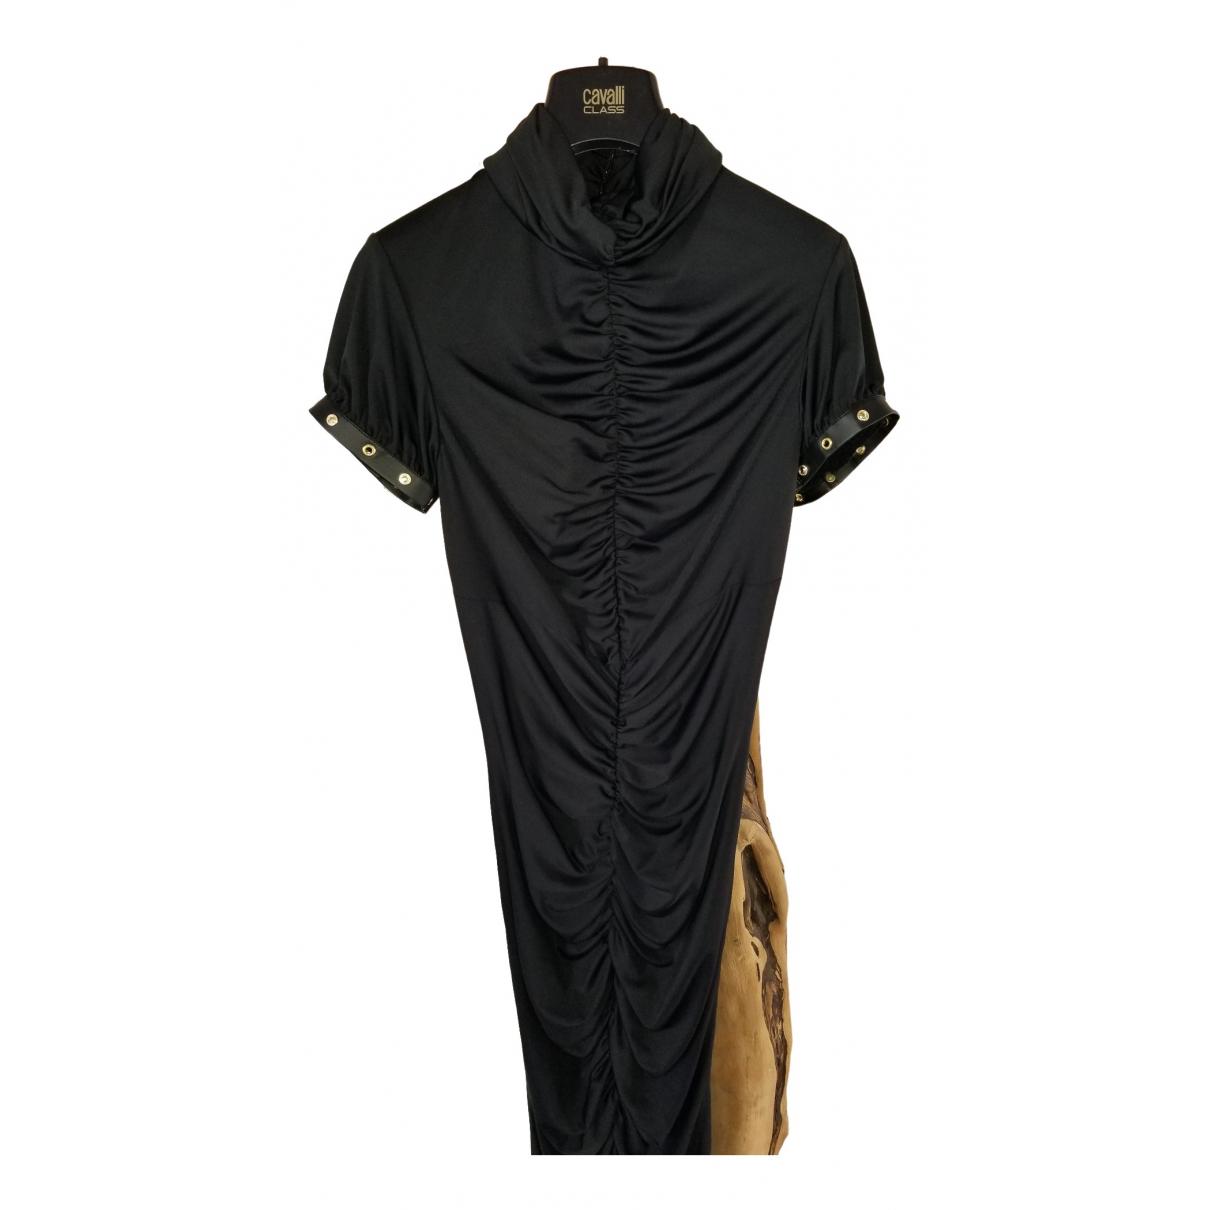 Roberto Cavalli \N Black dress for Women 42 IT